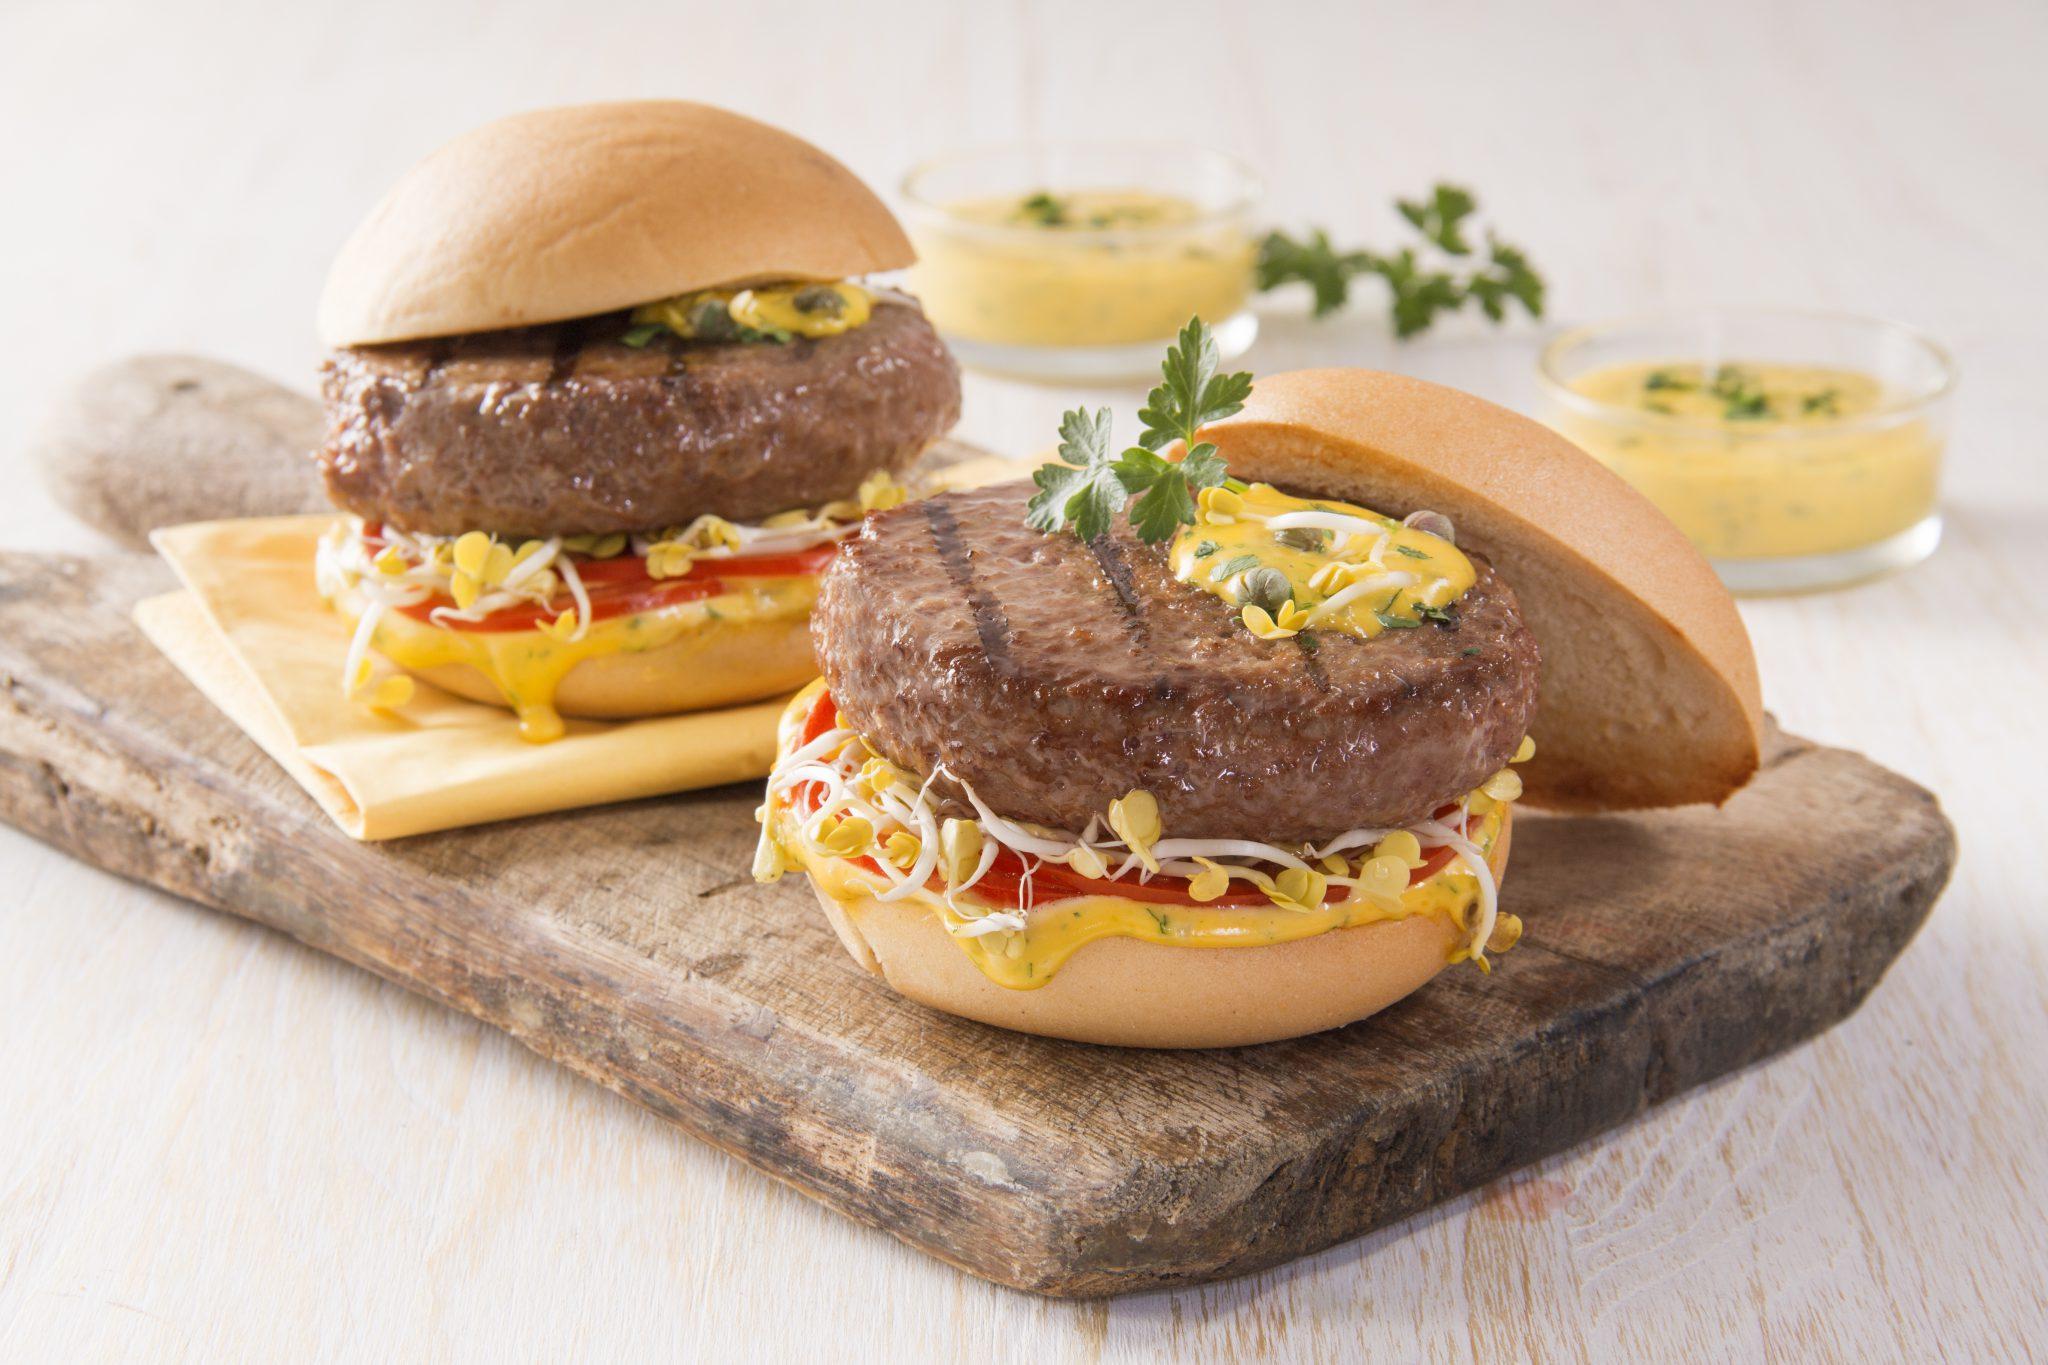 Hamburger Gourmet con germogli di soia, salsa tartara e pomodoro